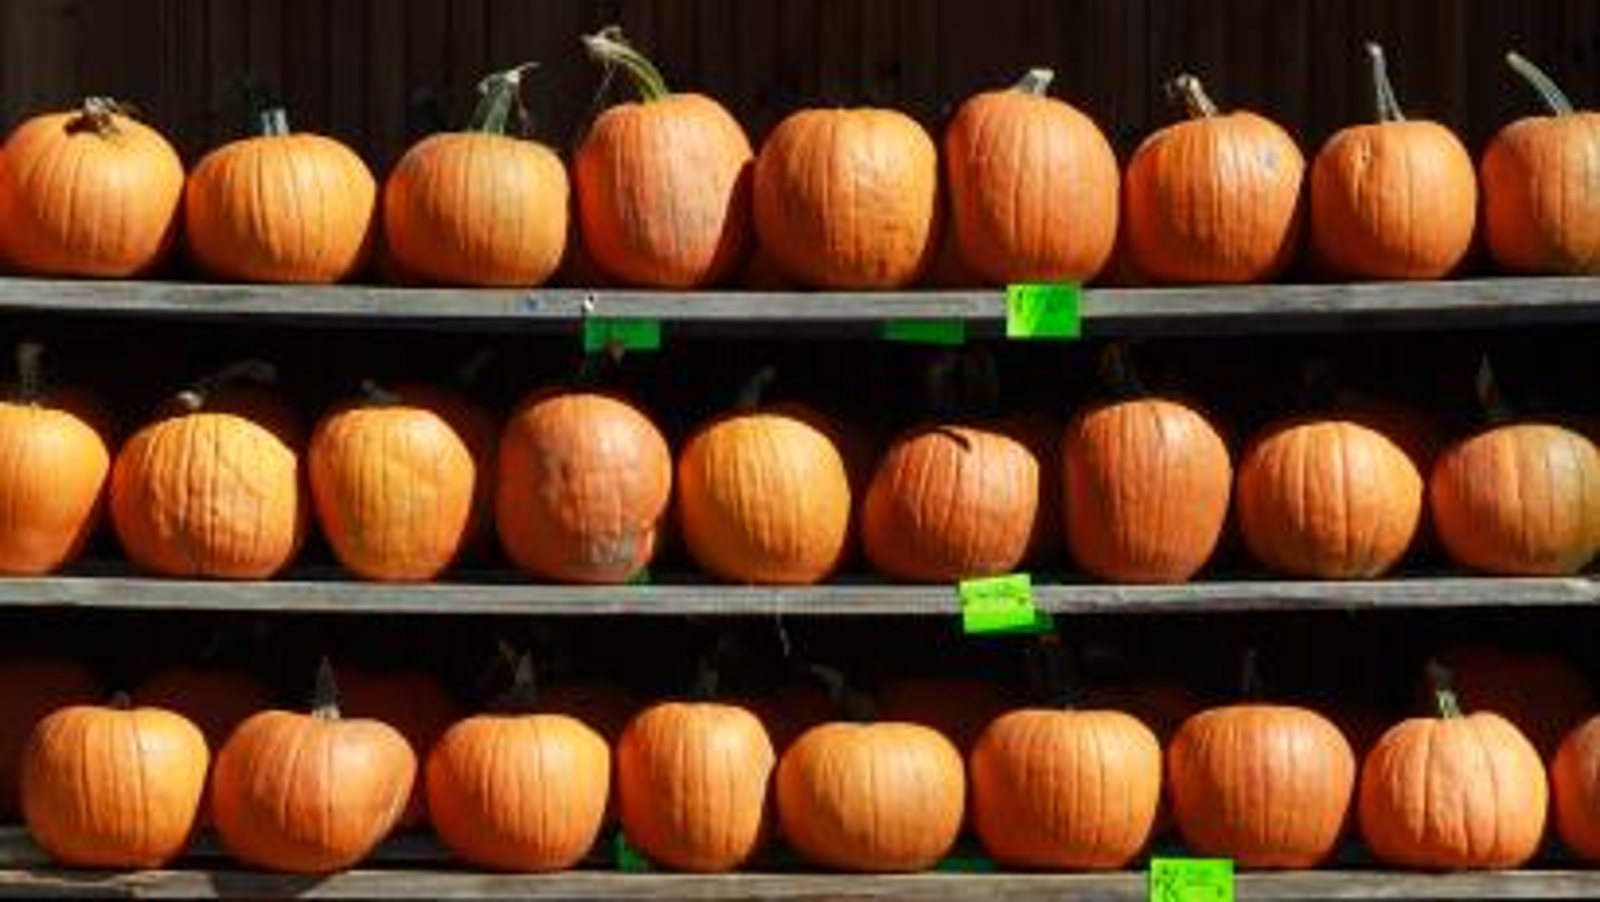 Starbucks Psl Season Get Over It America Pumpkin Spice